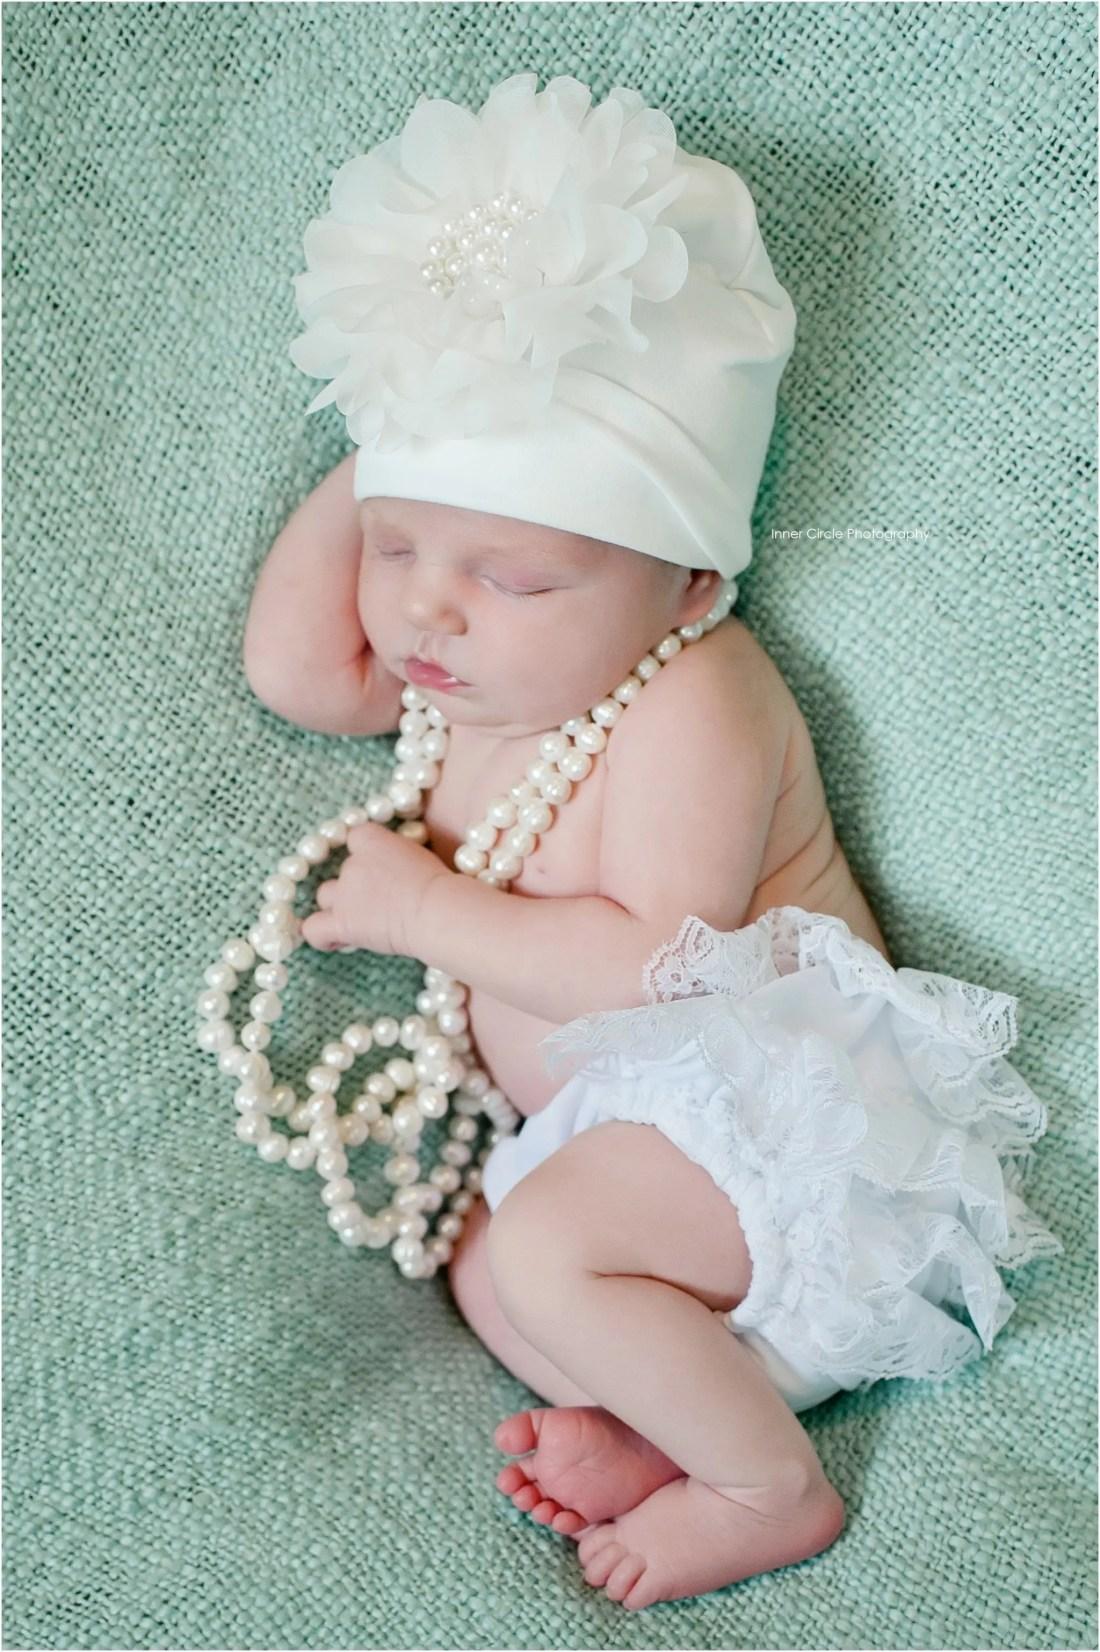 lucyM_newborn_InnerCirclePhoto_006 Lucy NEWBORN